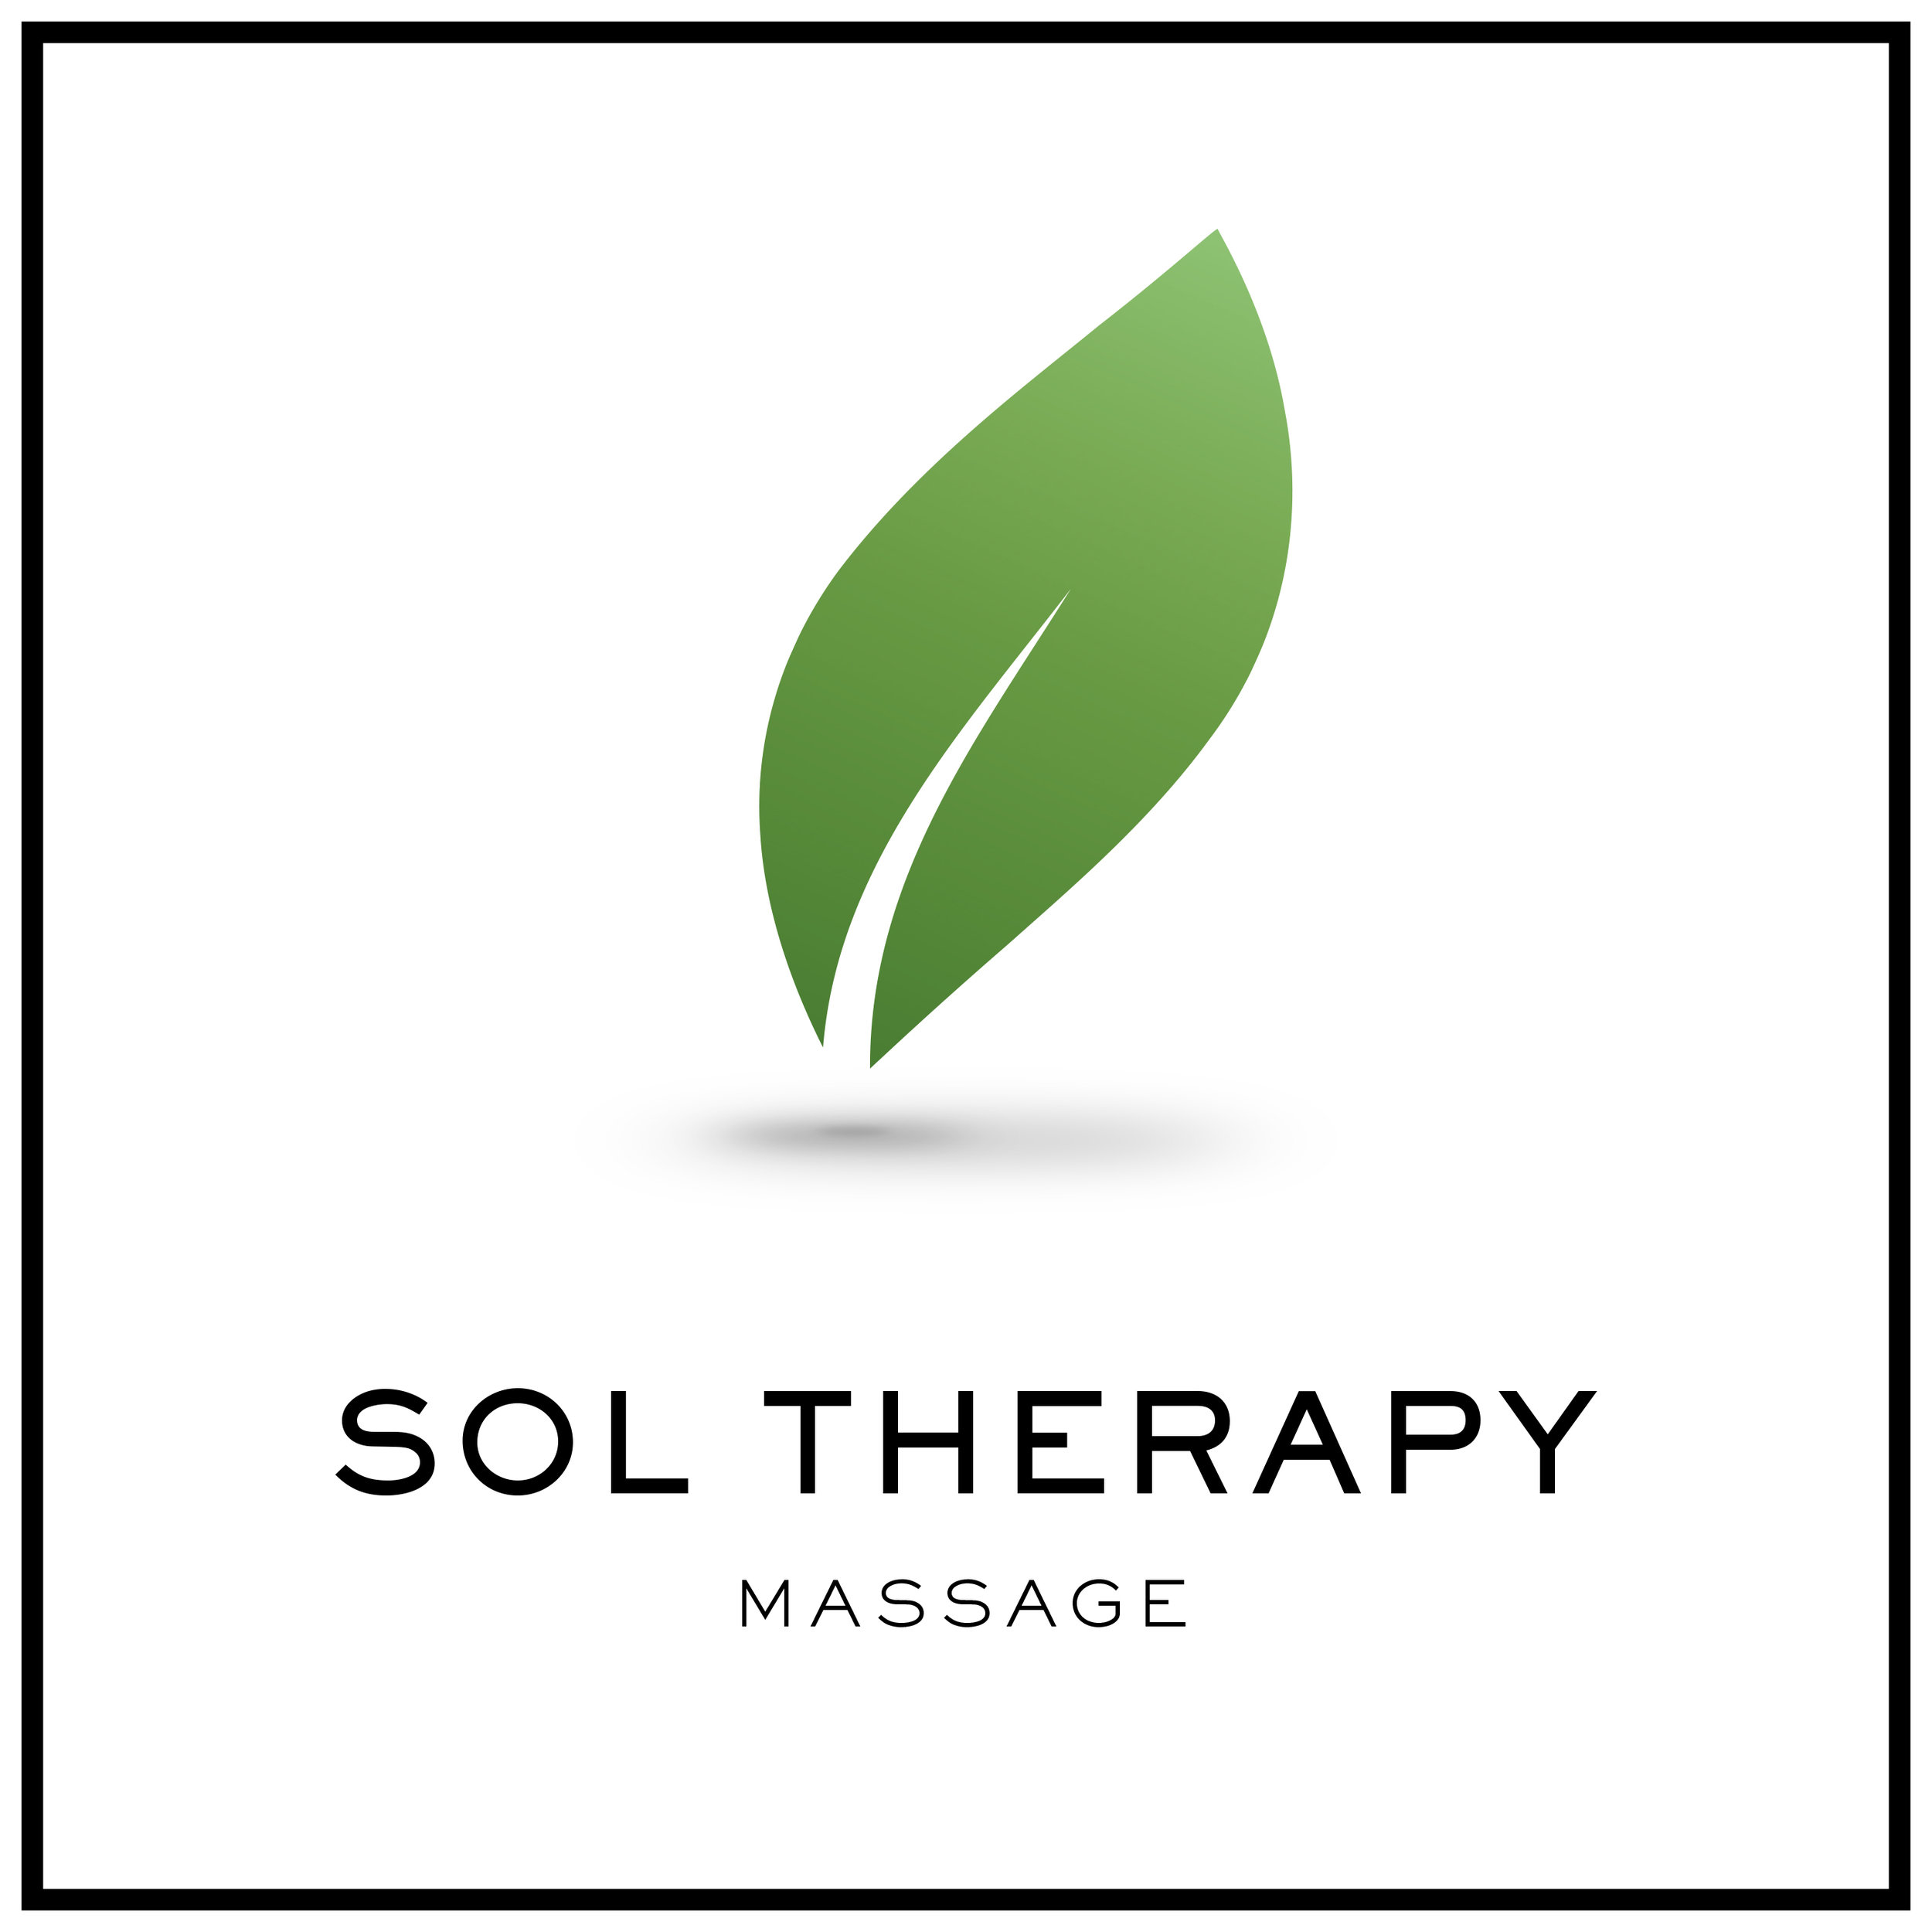 Sol Therapy [v3] Mobile Massage PS by Graham Hnedak Brand G Creative 27 April 2016.jpg